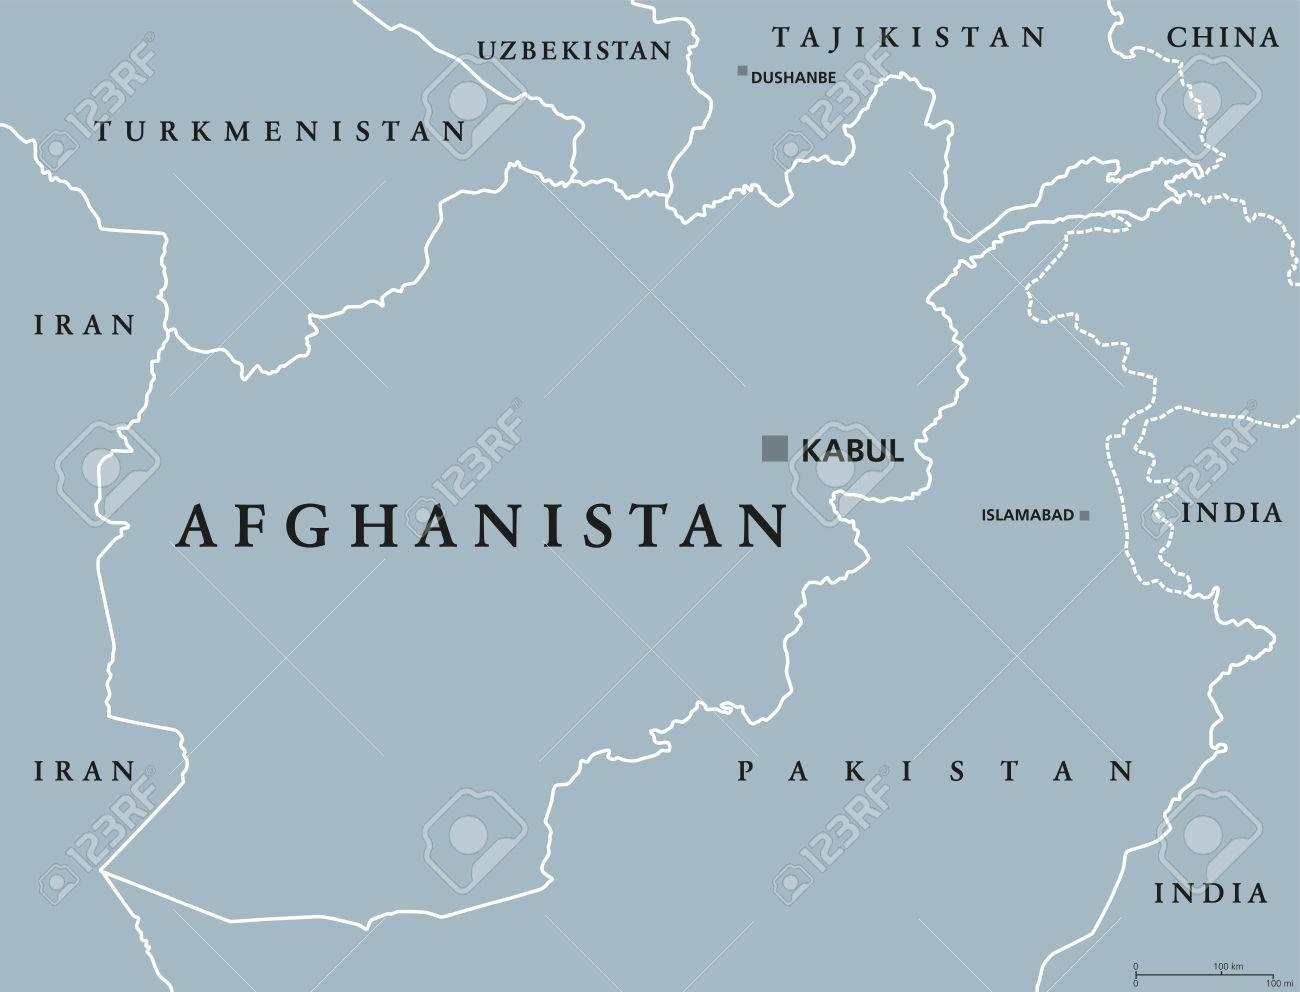 Afghanistan Political Map With Capital Kabul And Borders Islamic